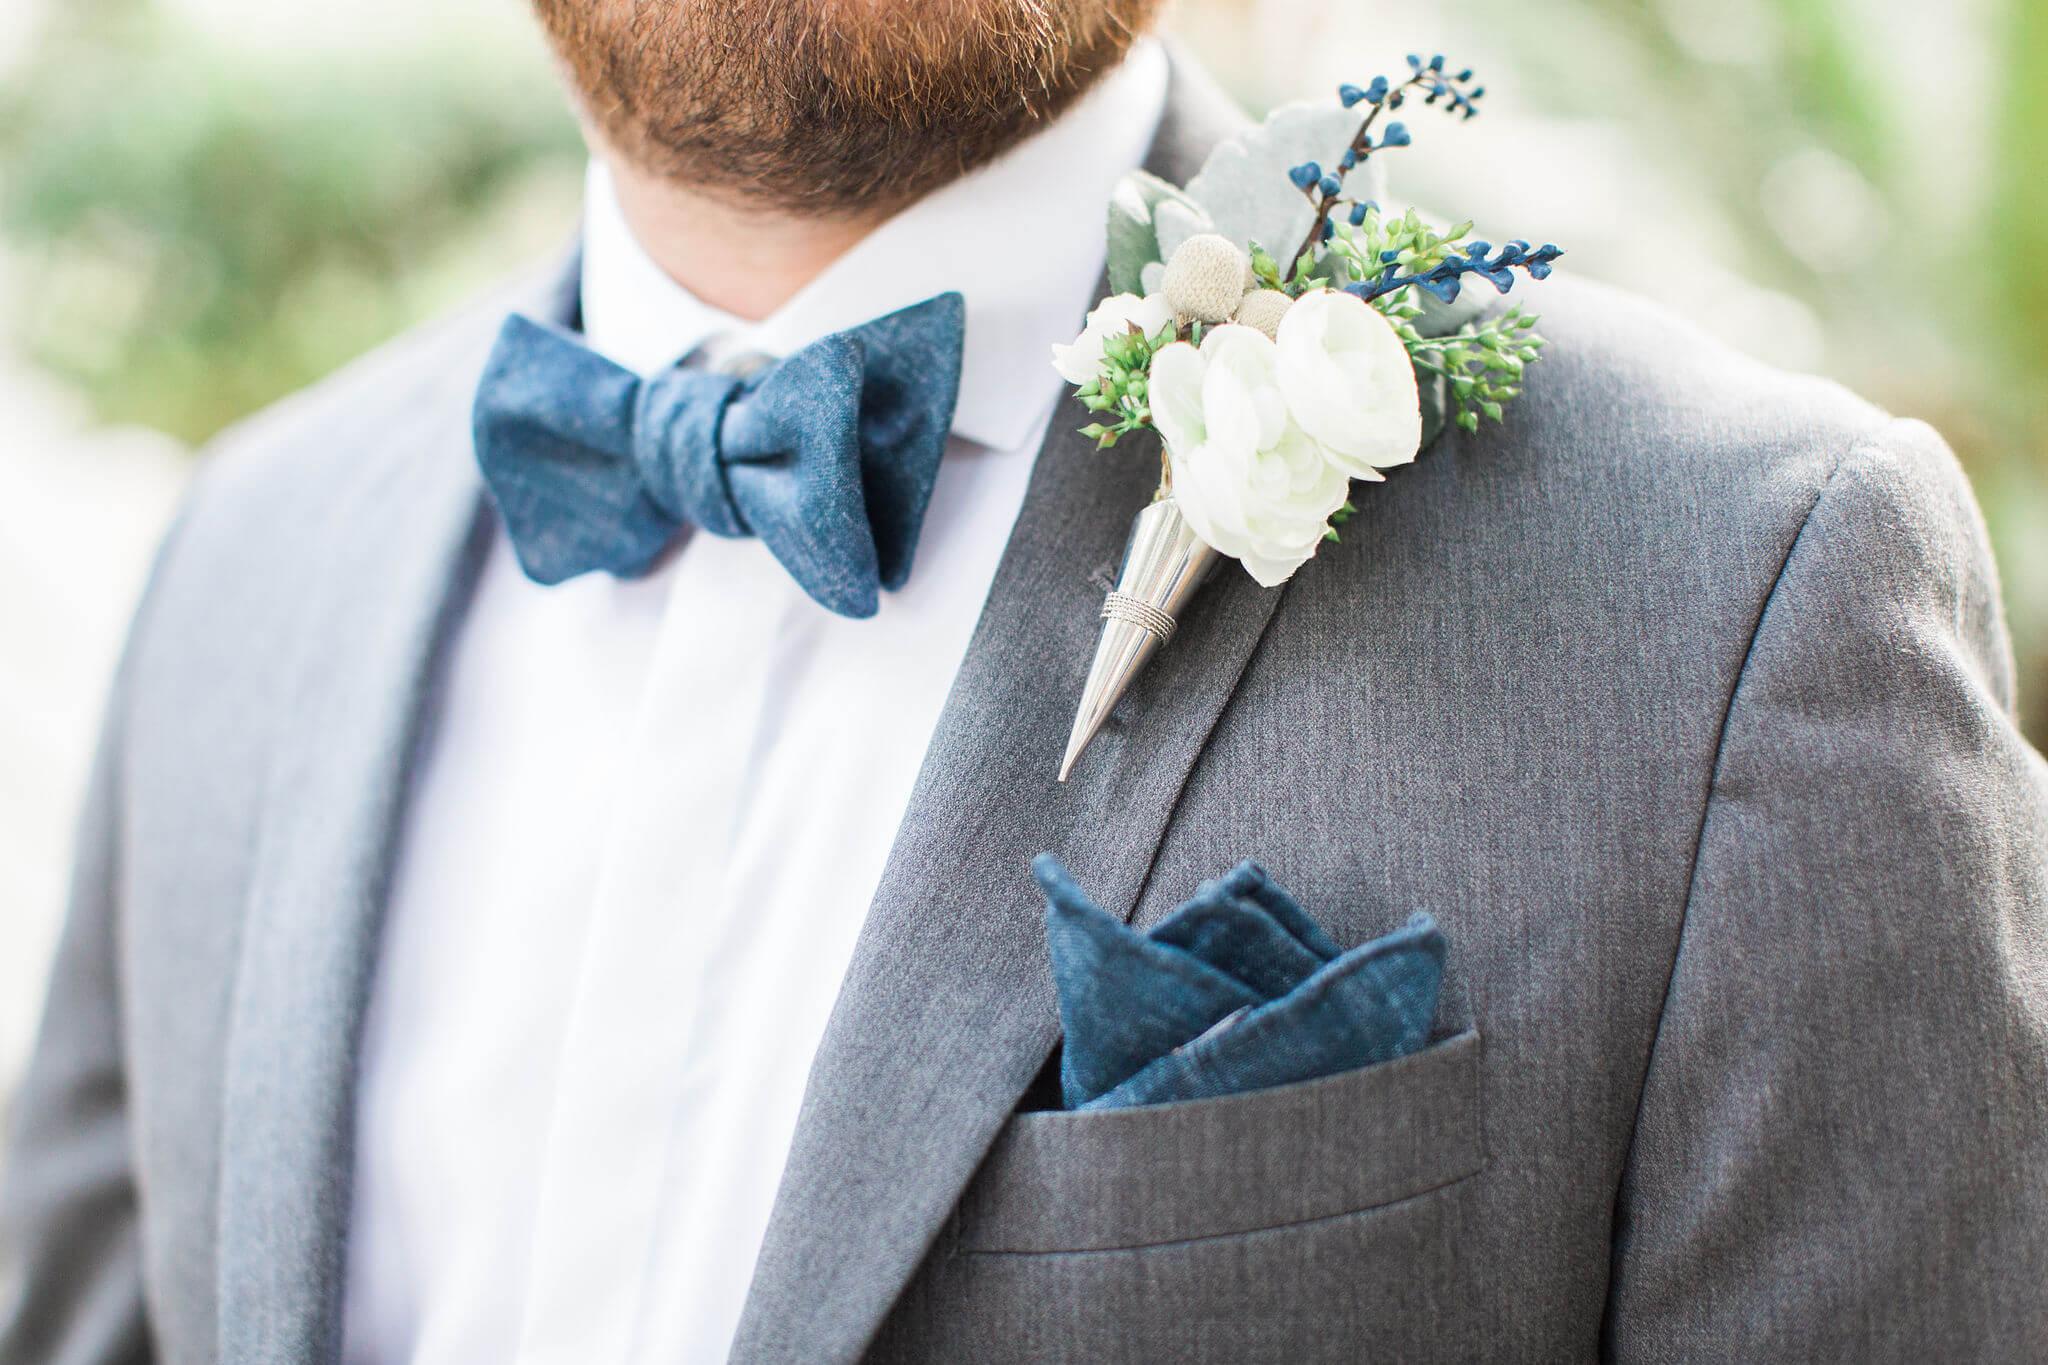 Apt-b-photography-savannah-wedding-photographer-savannah-wedding-hilton-head-wedding-photographer-103.JPG